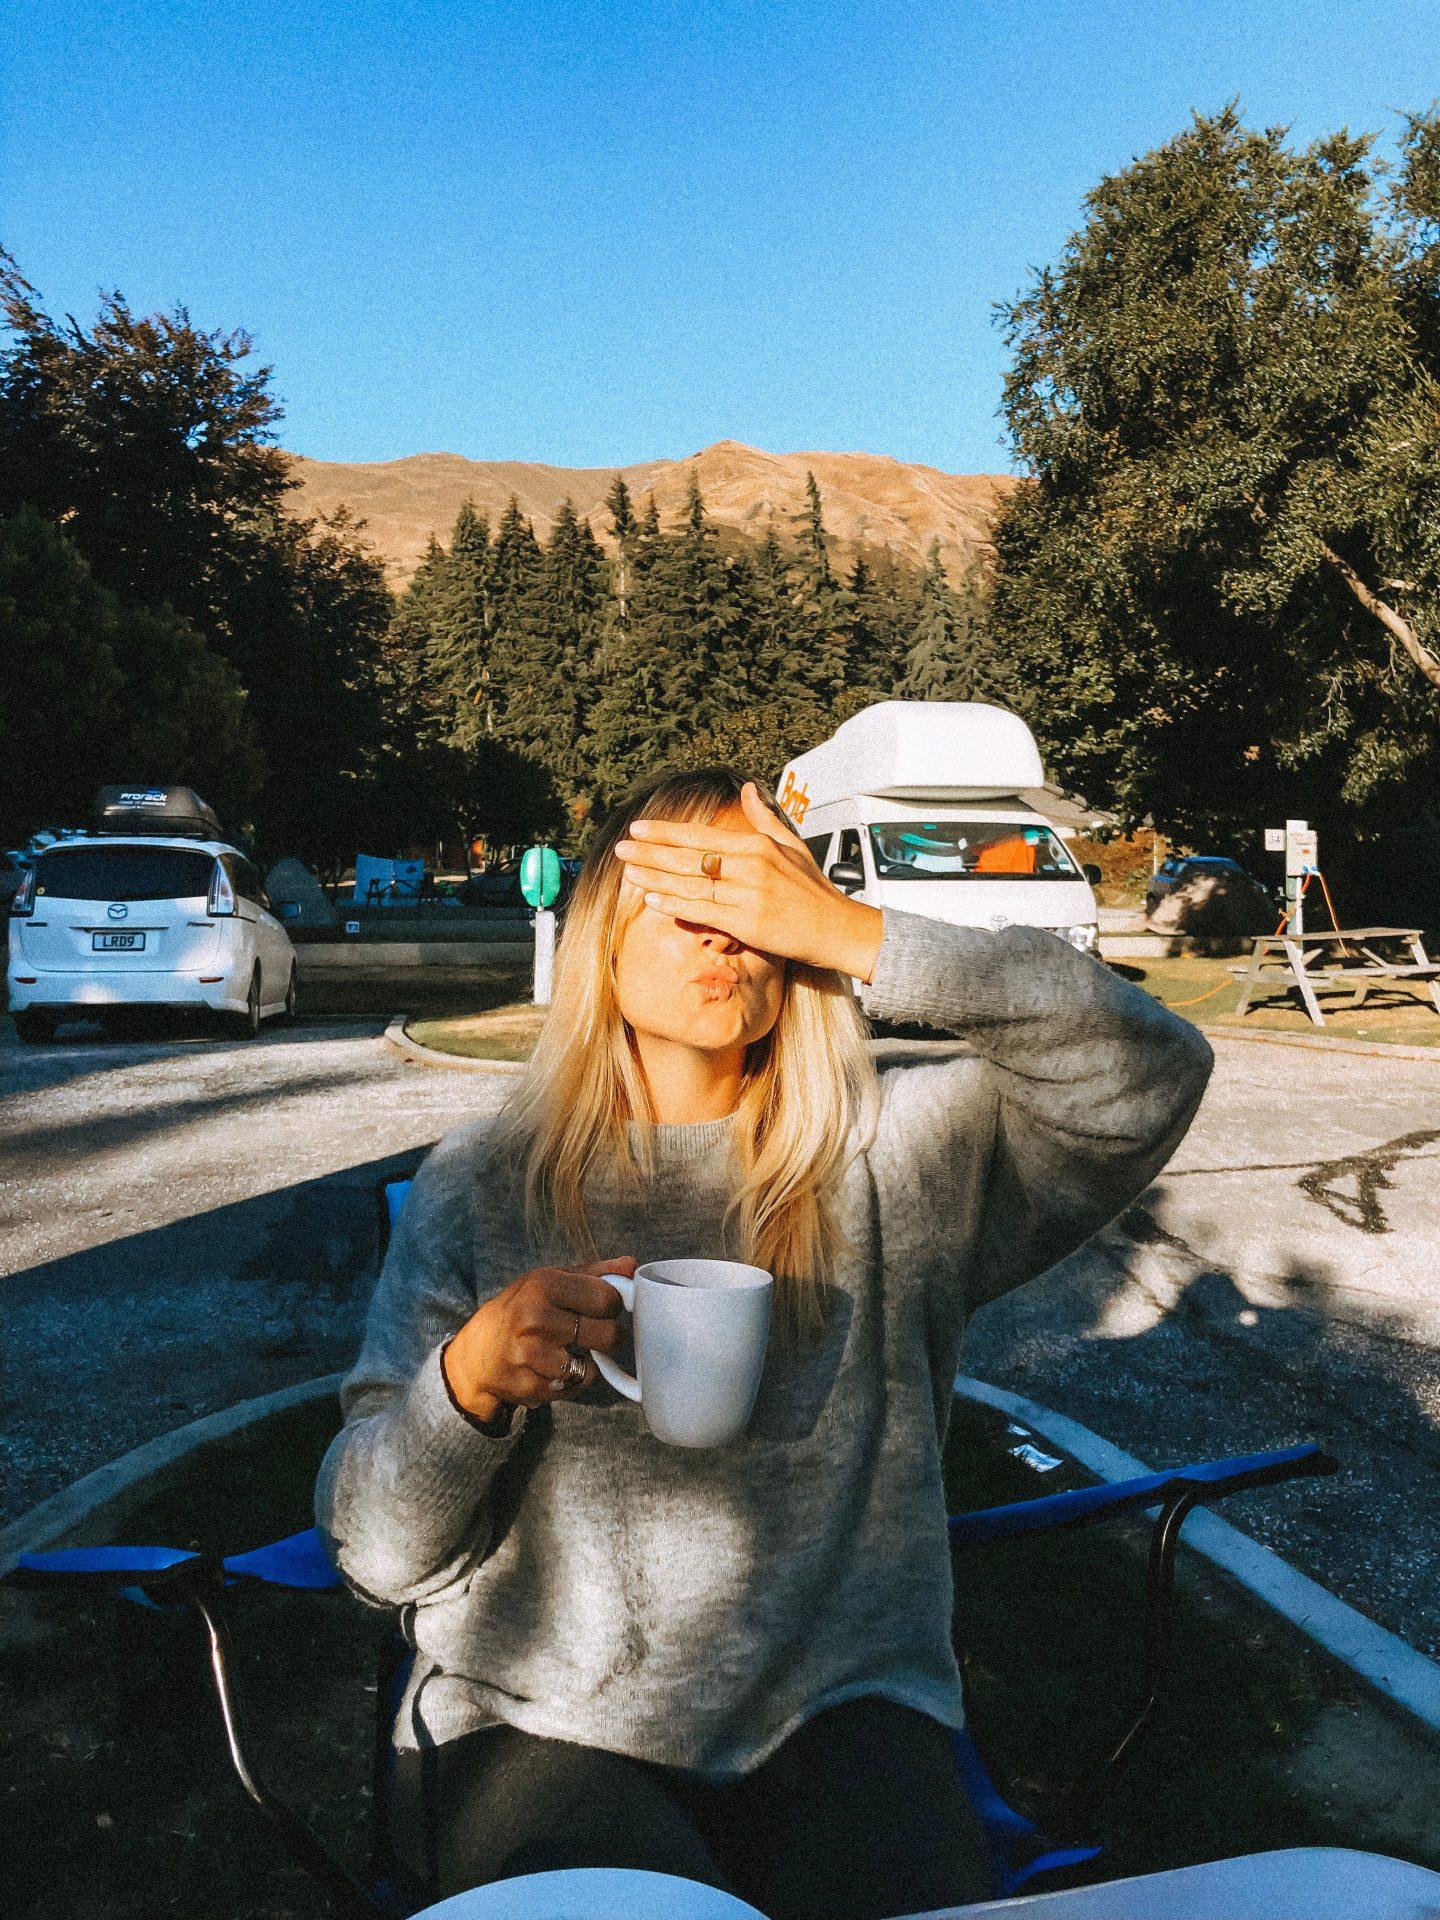 Camping Van Nouvelle-Zélande - Blondie Baby blog voyages et mode